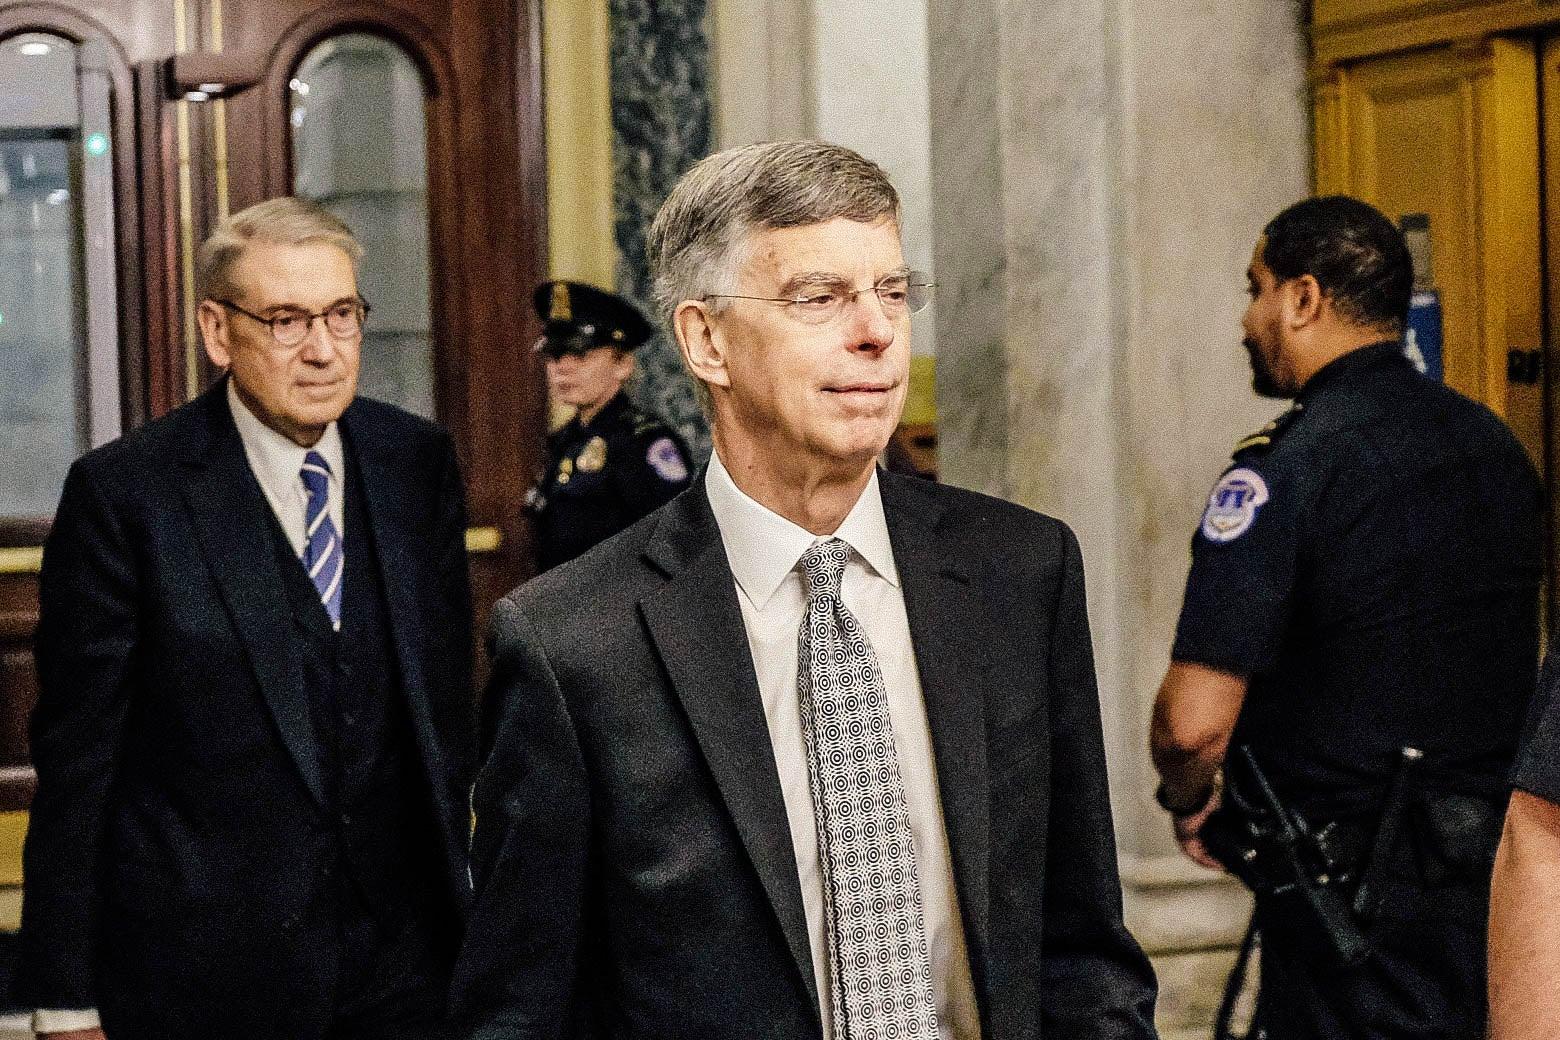 slate.com - William Saletan - Taylor's Testimony Goes Way Beyond Quid Pro Quo